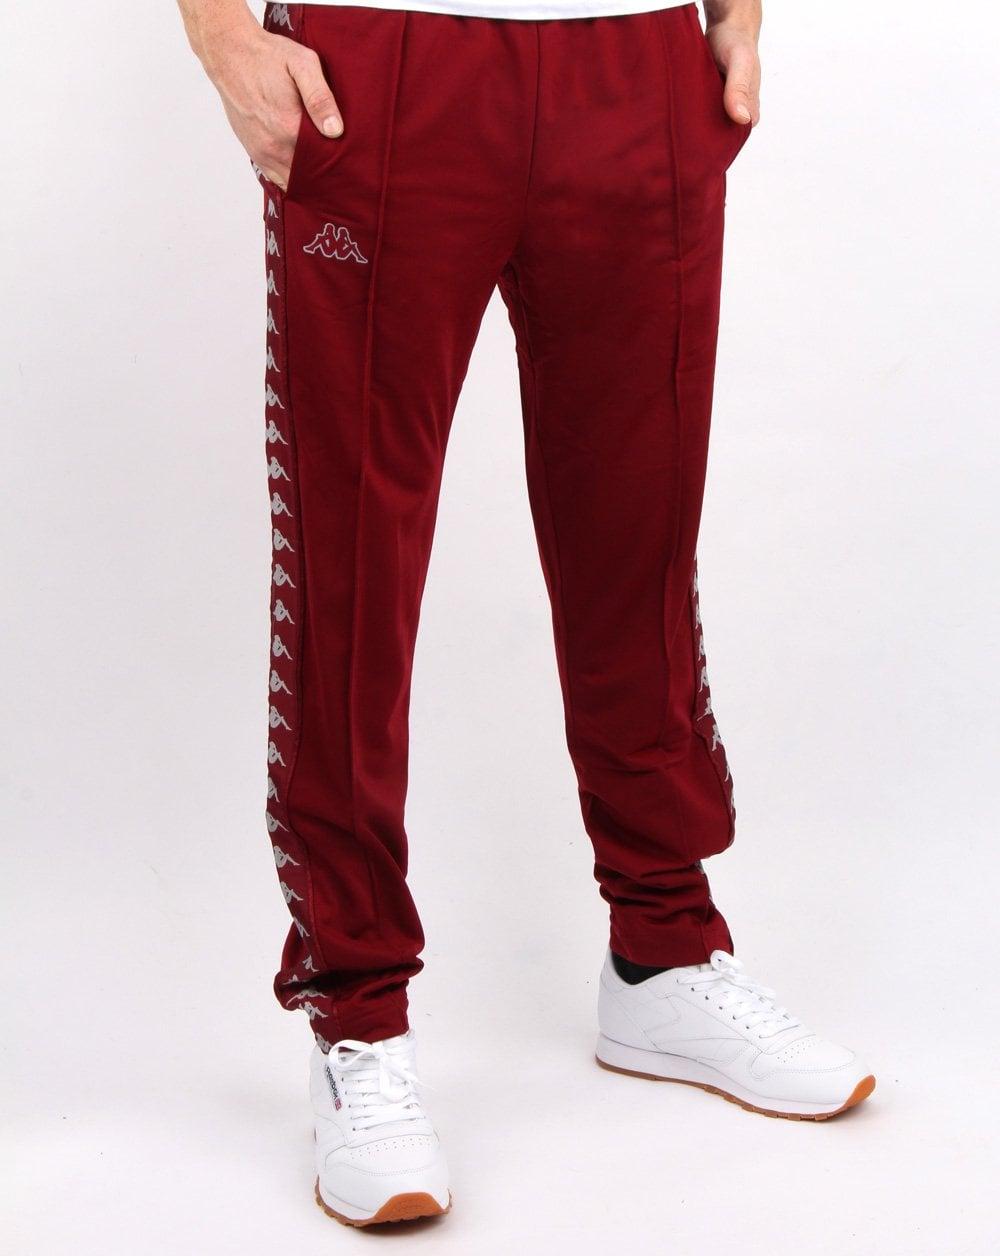 Kappa tracksuit pants